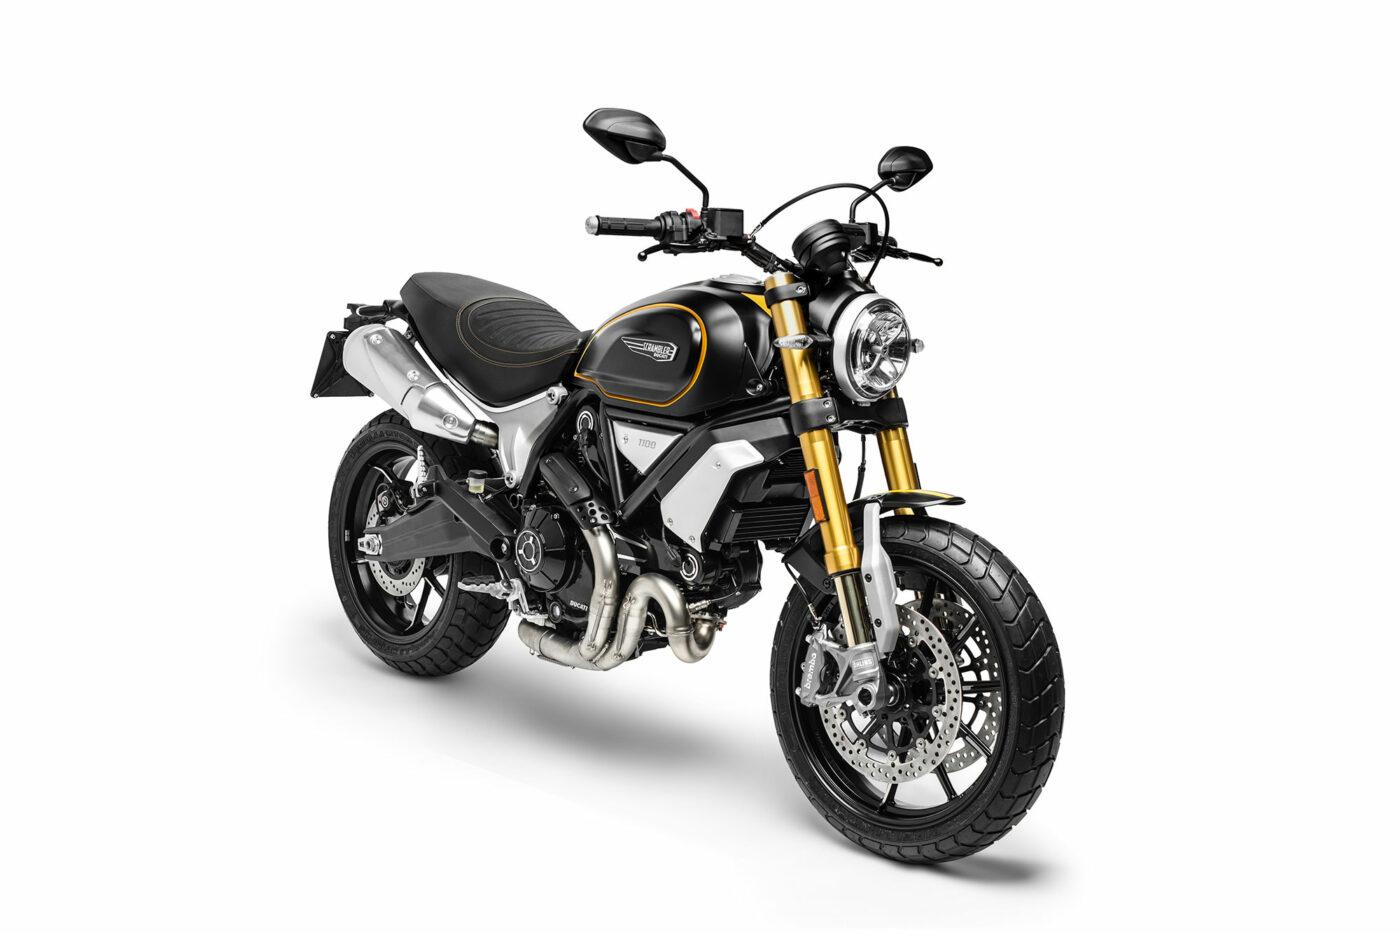 2018 Ducati Scrambler 1100 1100 Special 1100 Sport Price Specs